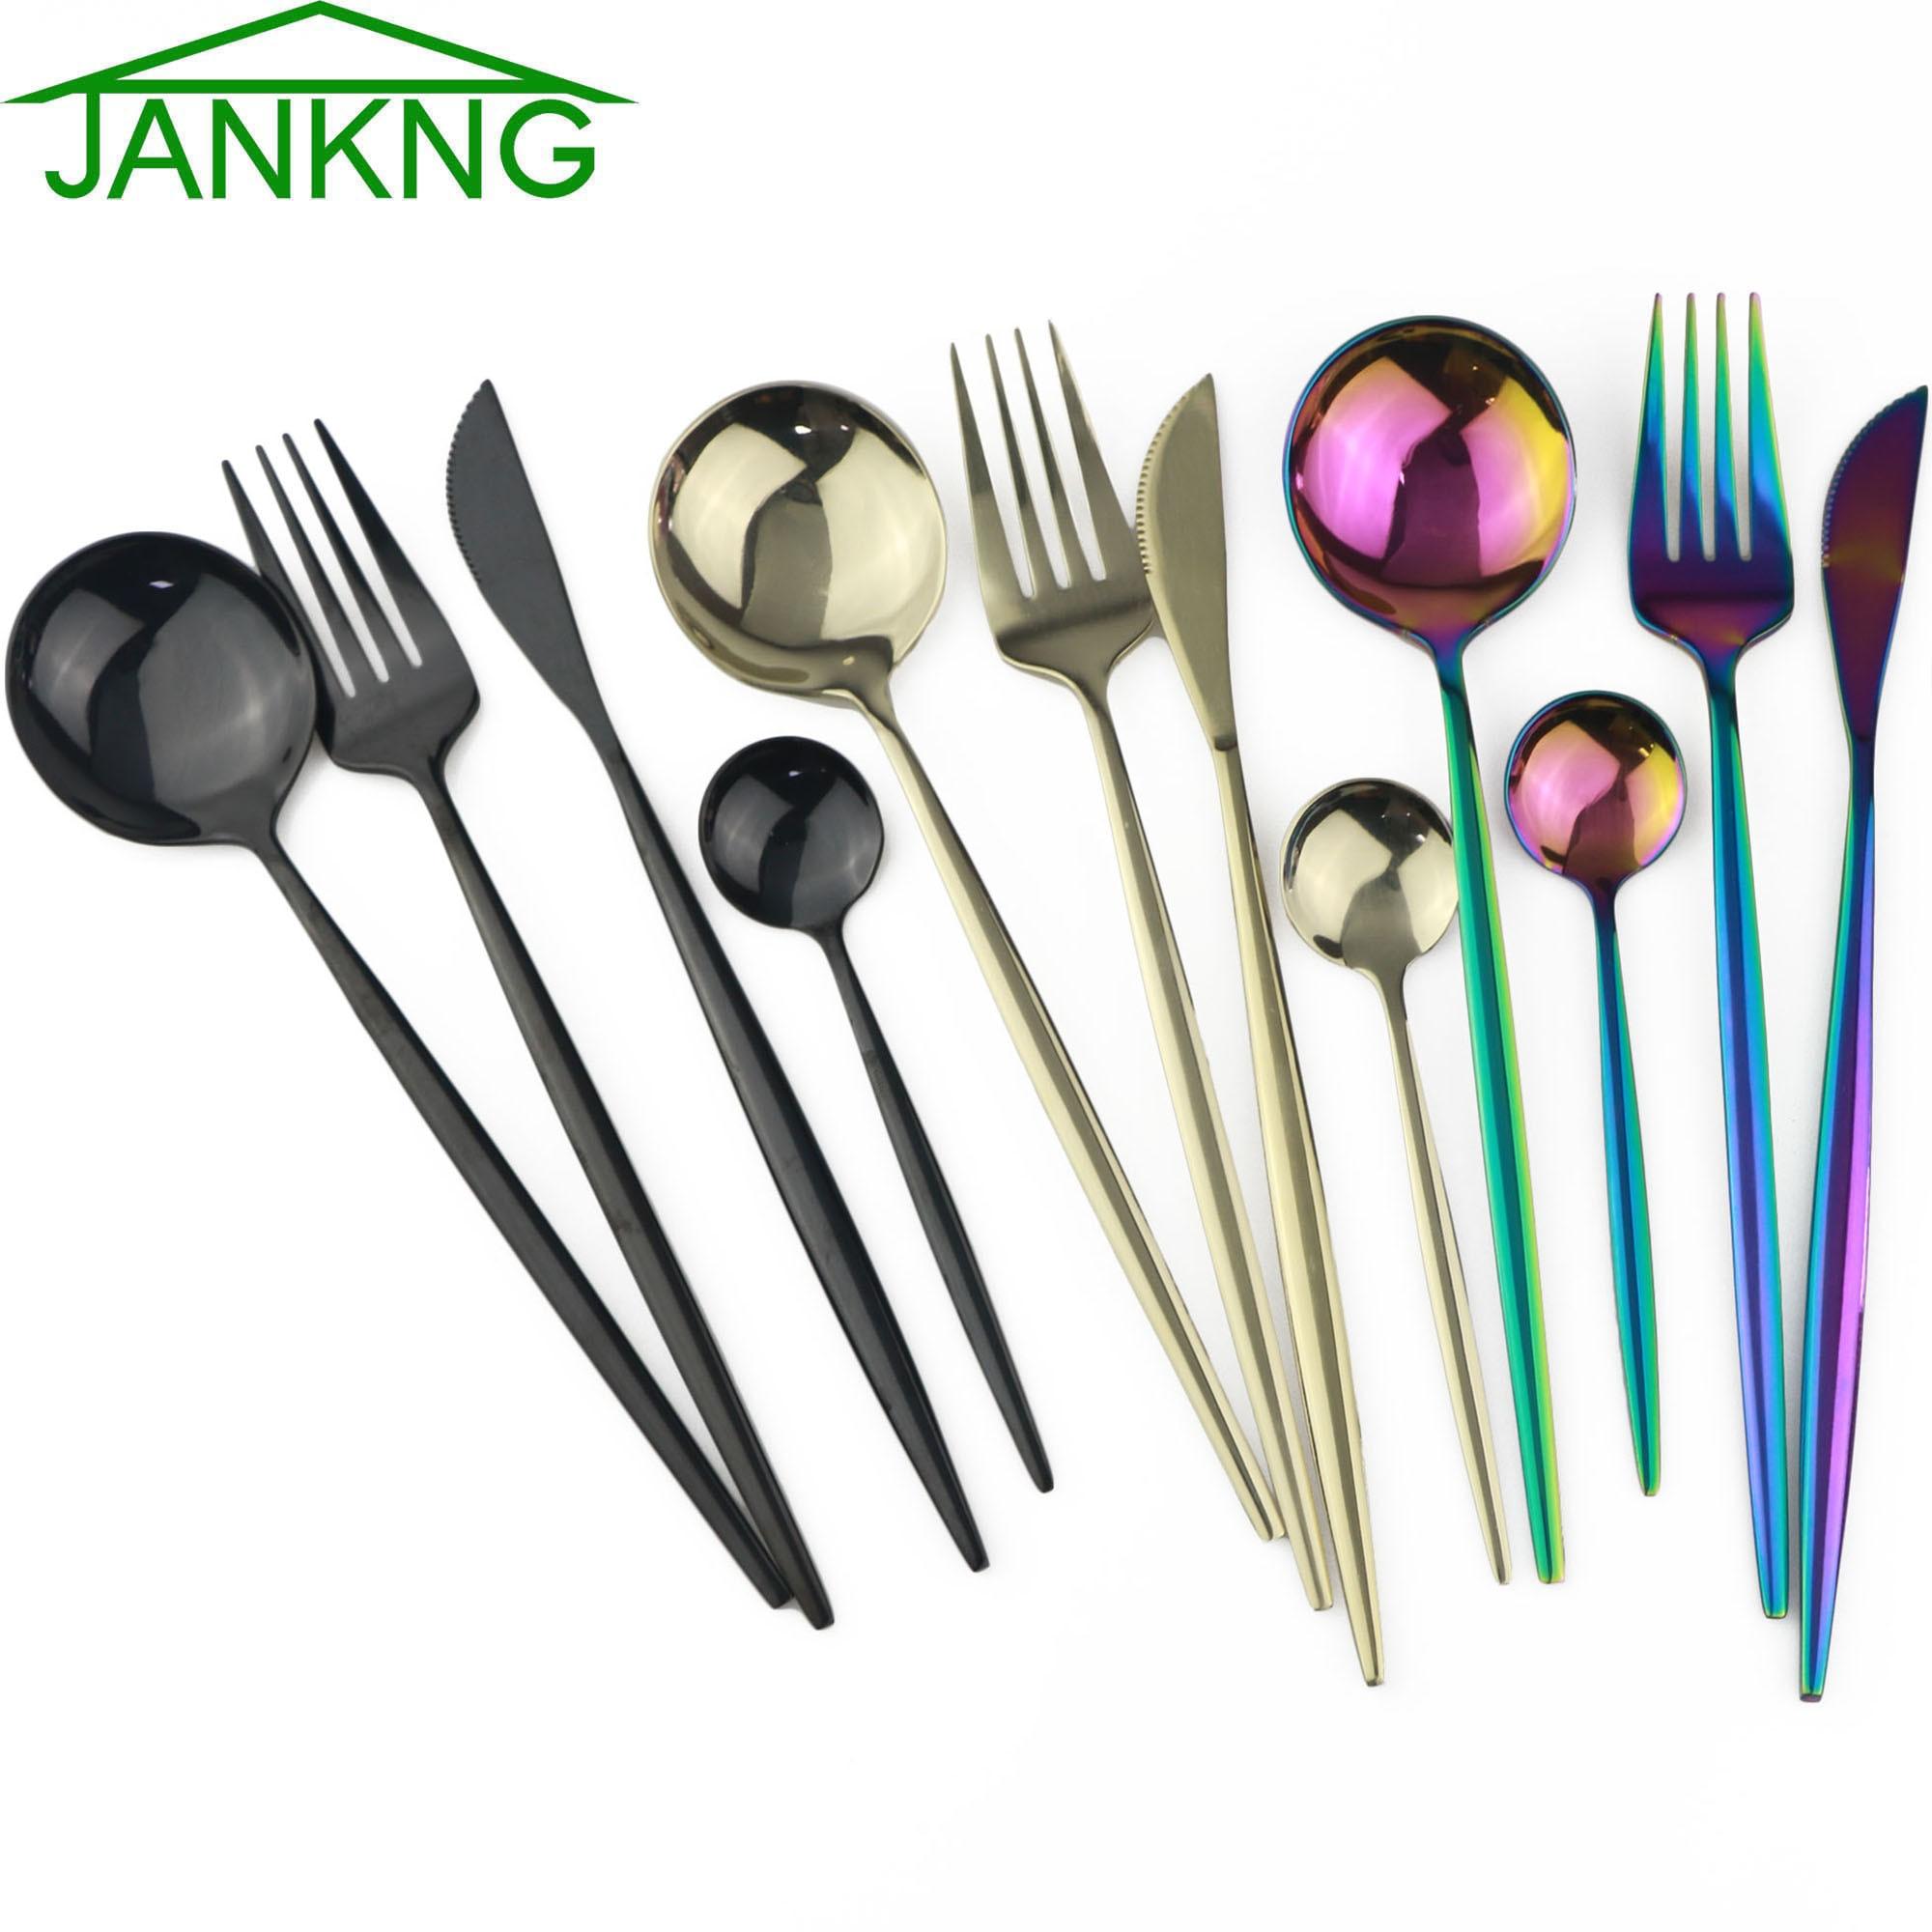 4PCS Rainbow//Rose Gold Stainless Steel XMAS Dinning Fork Cutlery Spoon Tableware